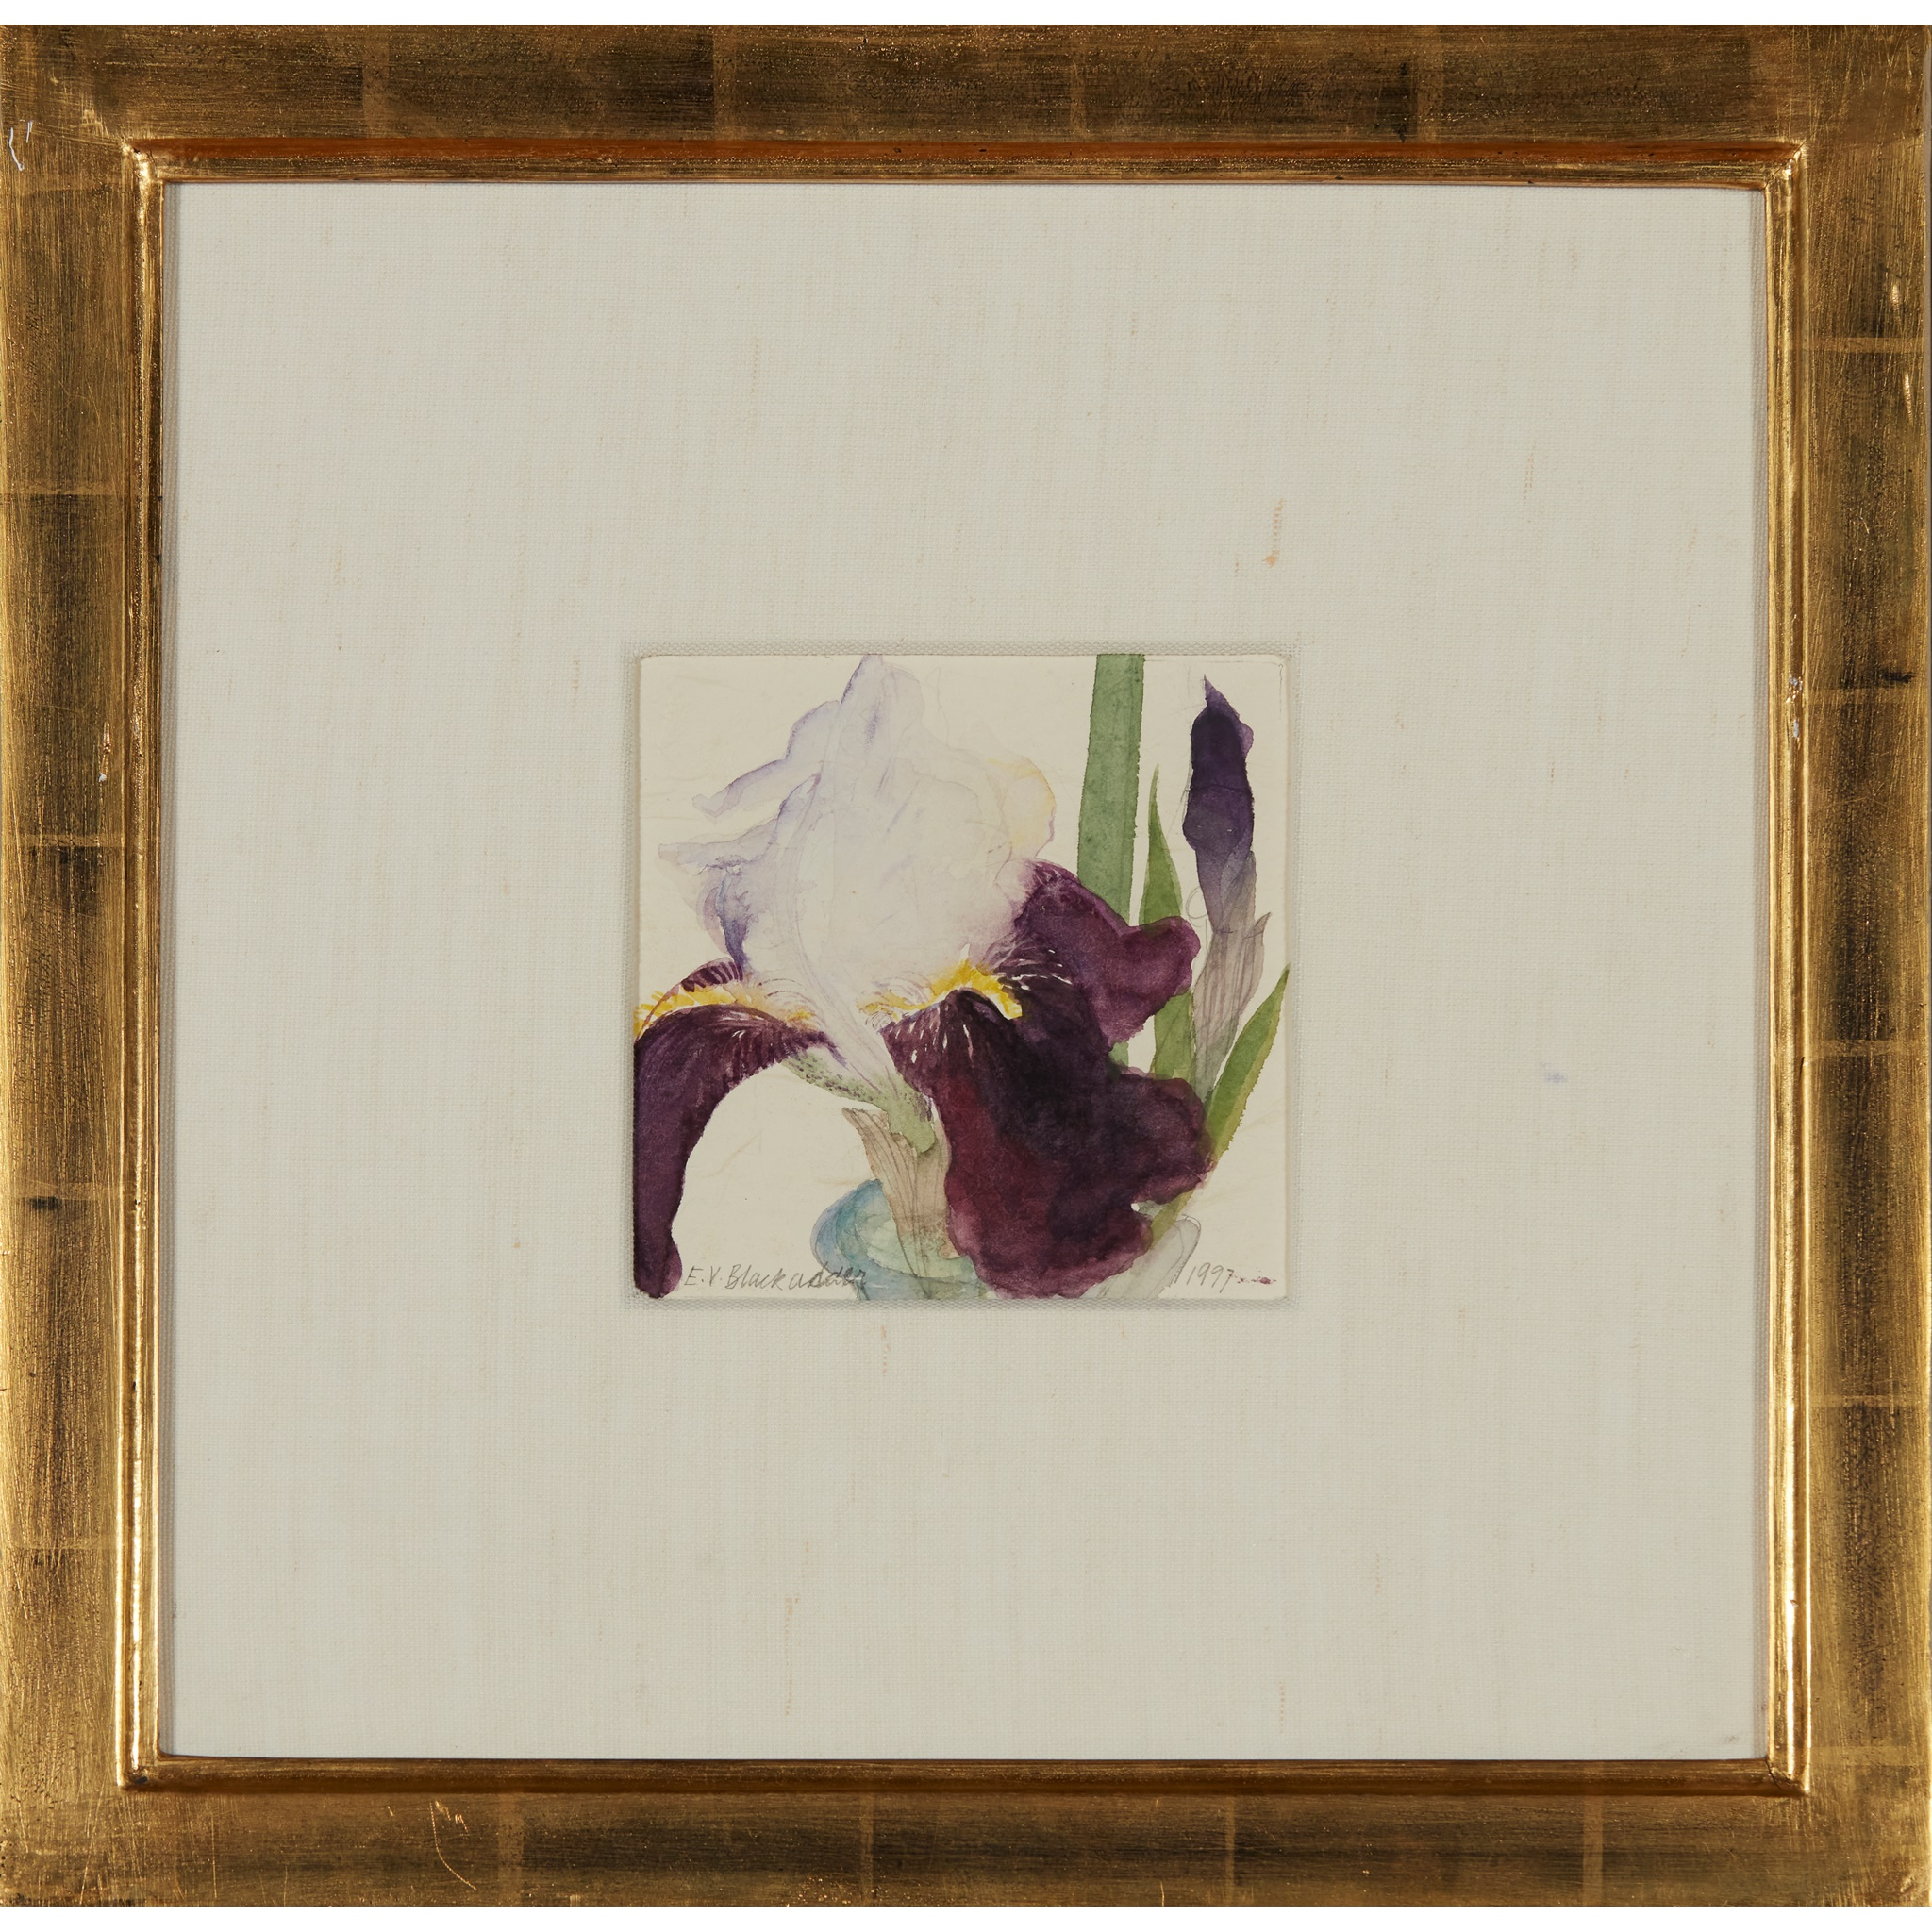 § DAME ELIZABETH BLACKADDER O.B.E., R.A., R.S.A., R.S.W., R.G.I., D.Litt (SCOTTISH 1931-) IRIS, - Image 2 of 3